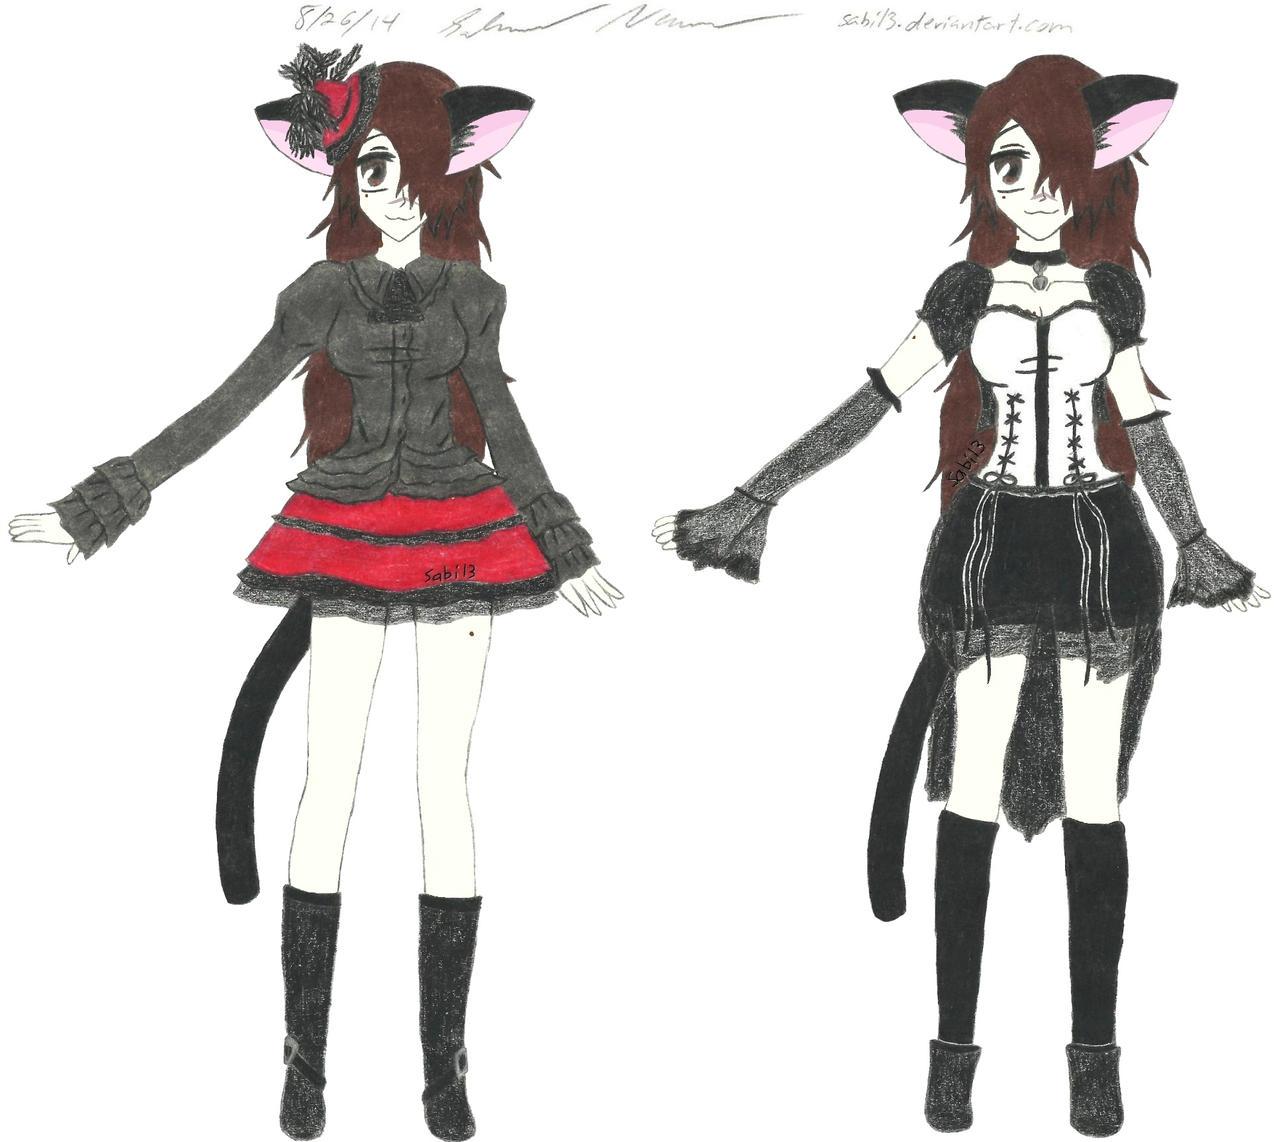 Sabi-chan Alternate Outfits by Sabi13